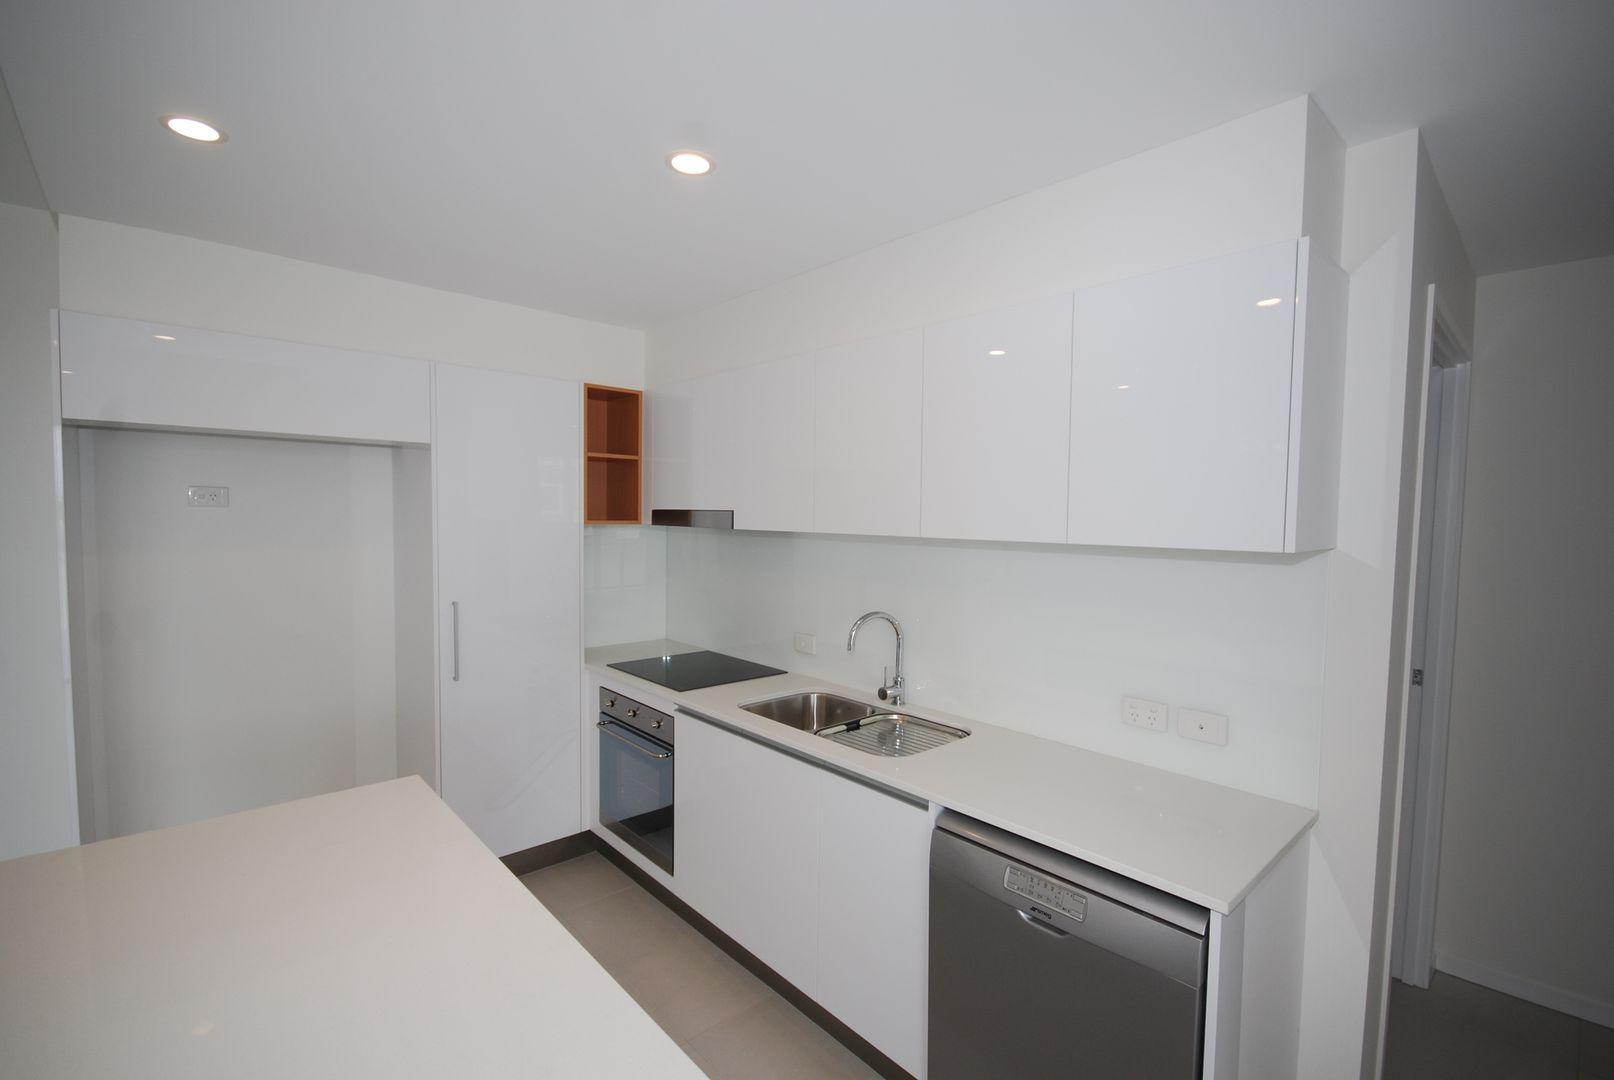 4/8 Springwood Street, Mount Gravatt QLD 4122, Image 2